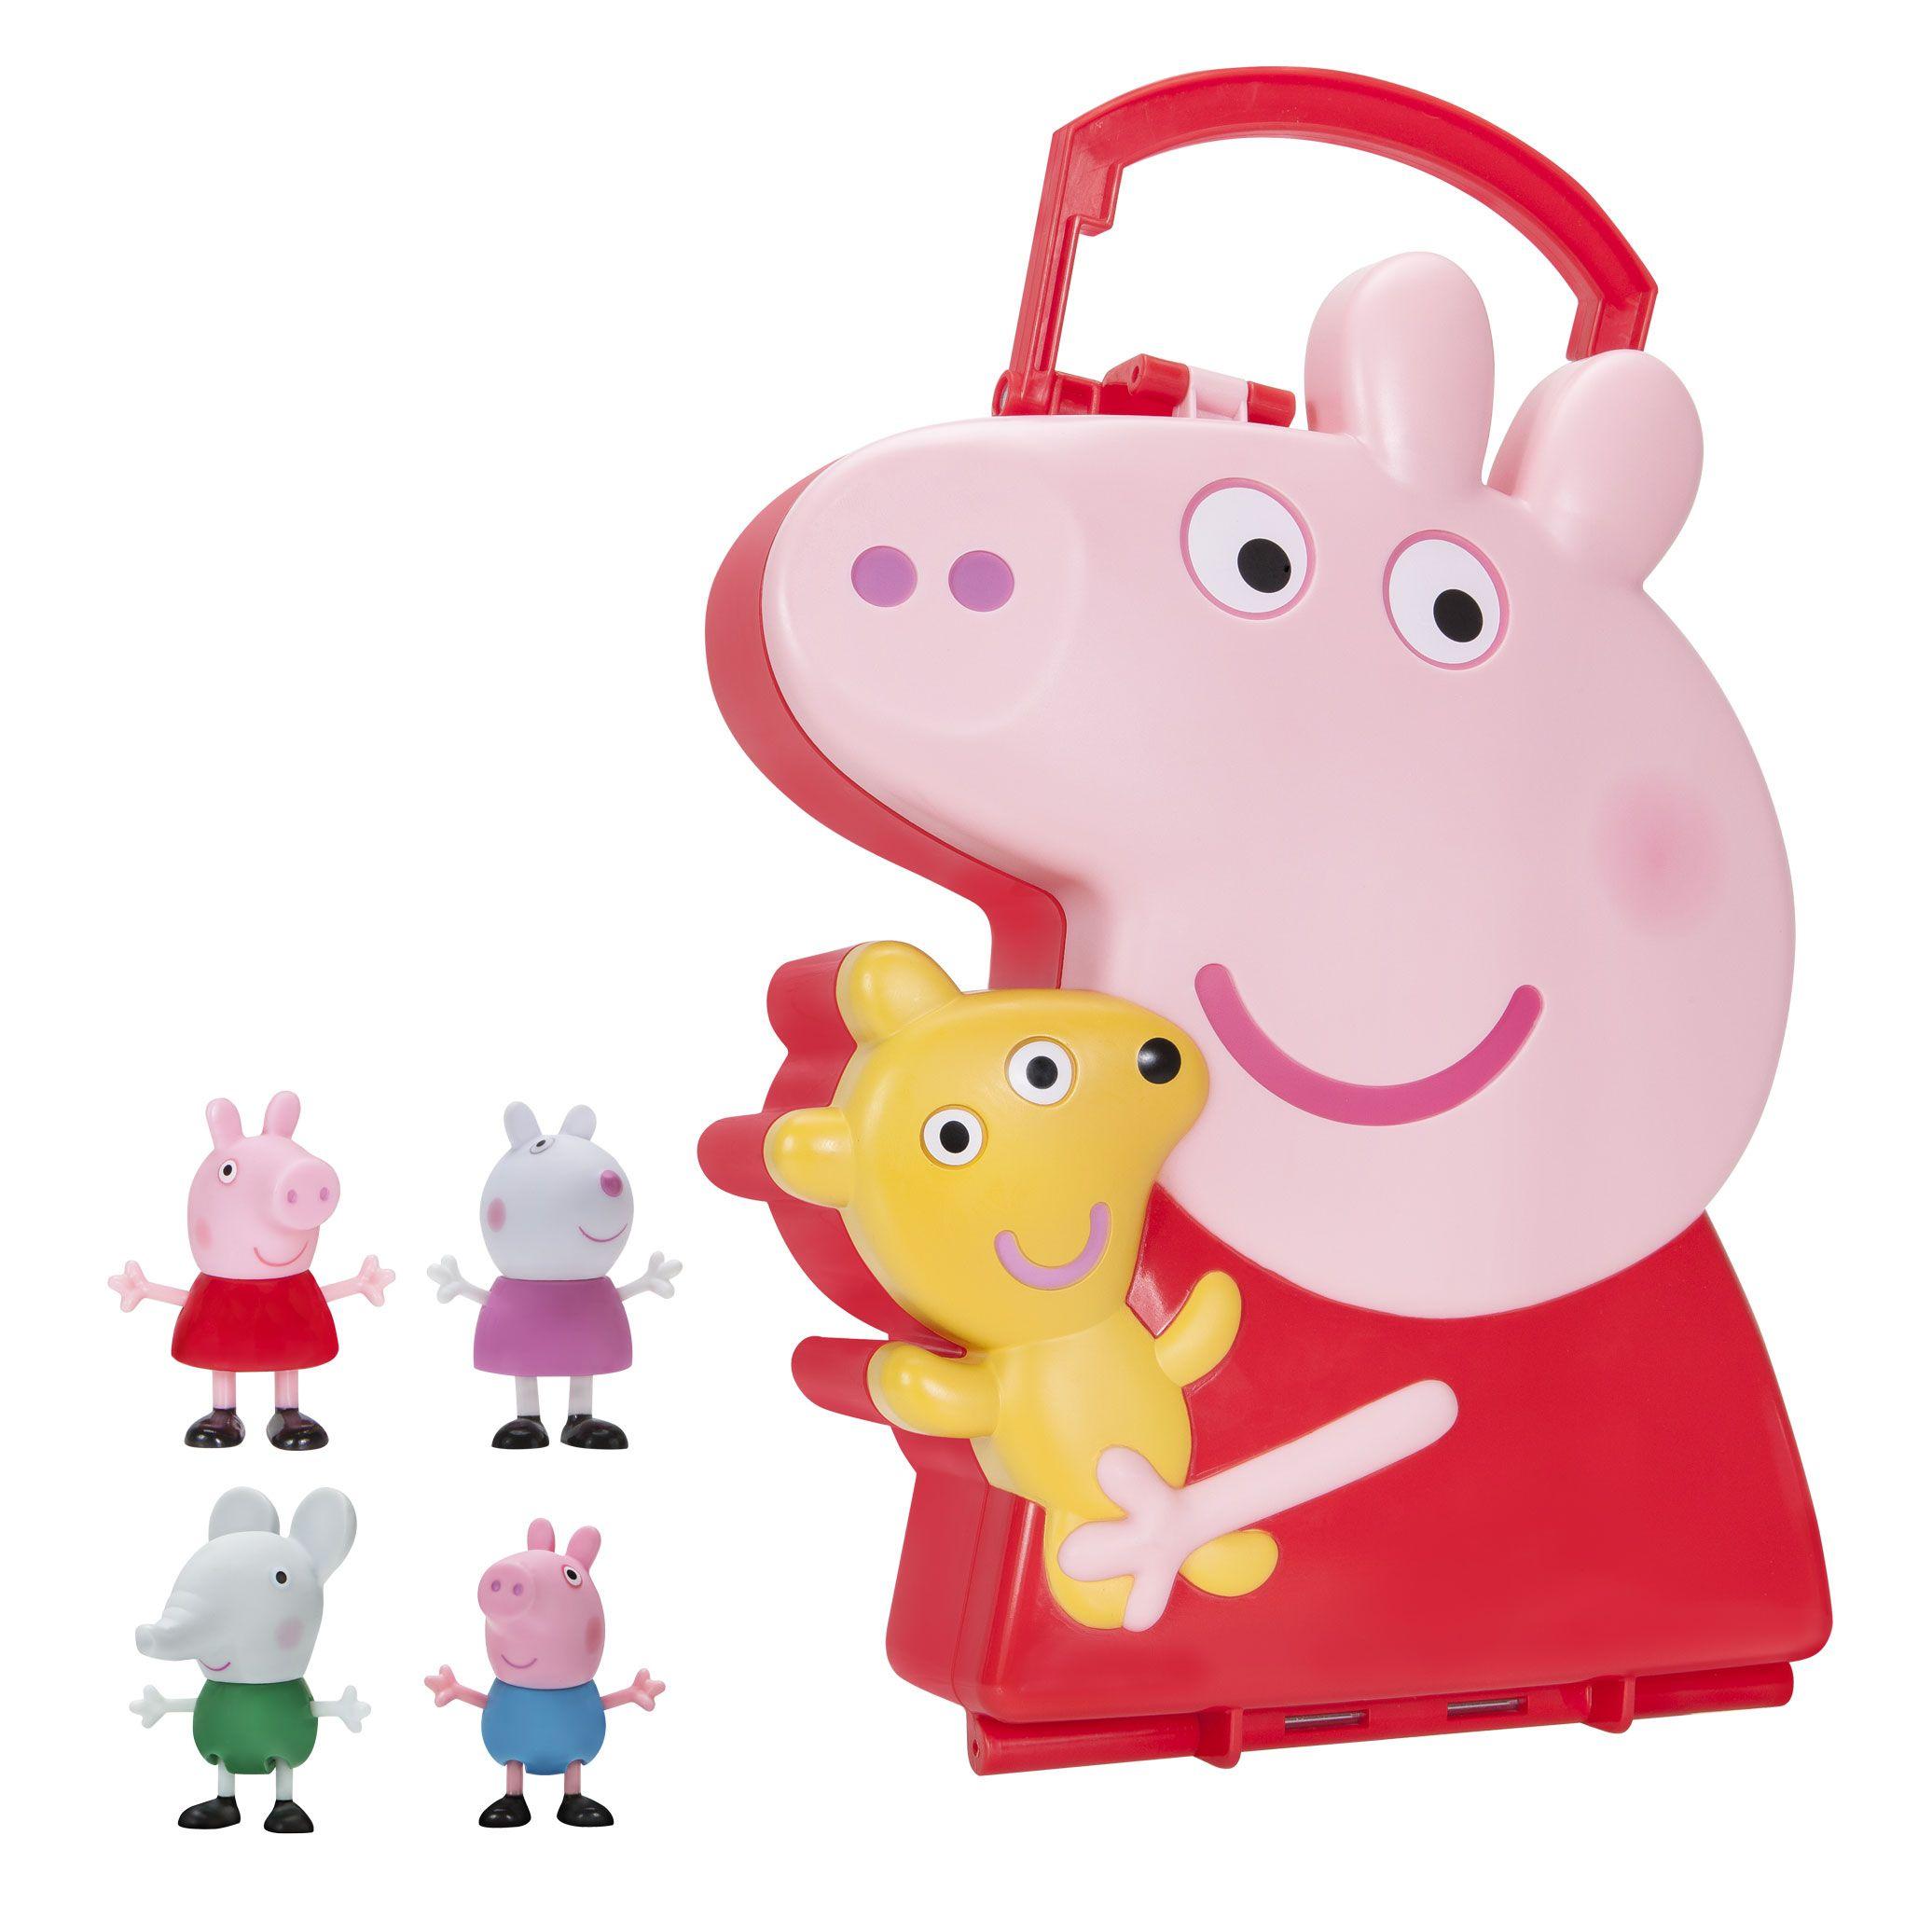 Peppa Pig Storage 4 Friends Figure Carry Case Walmart Com Peppa Pig Toys Peppa Pig Birthday Party Decorations Peppa Pig [ 2072 x 2072 Pixel ]